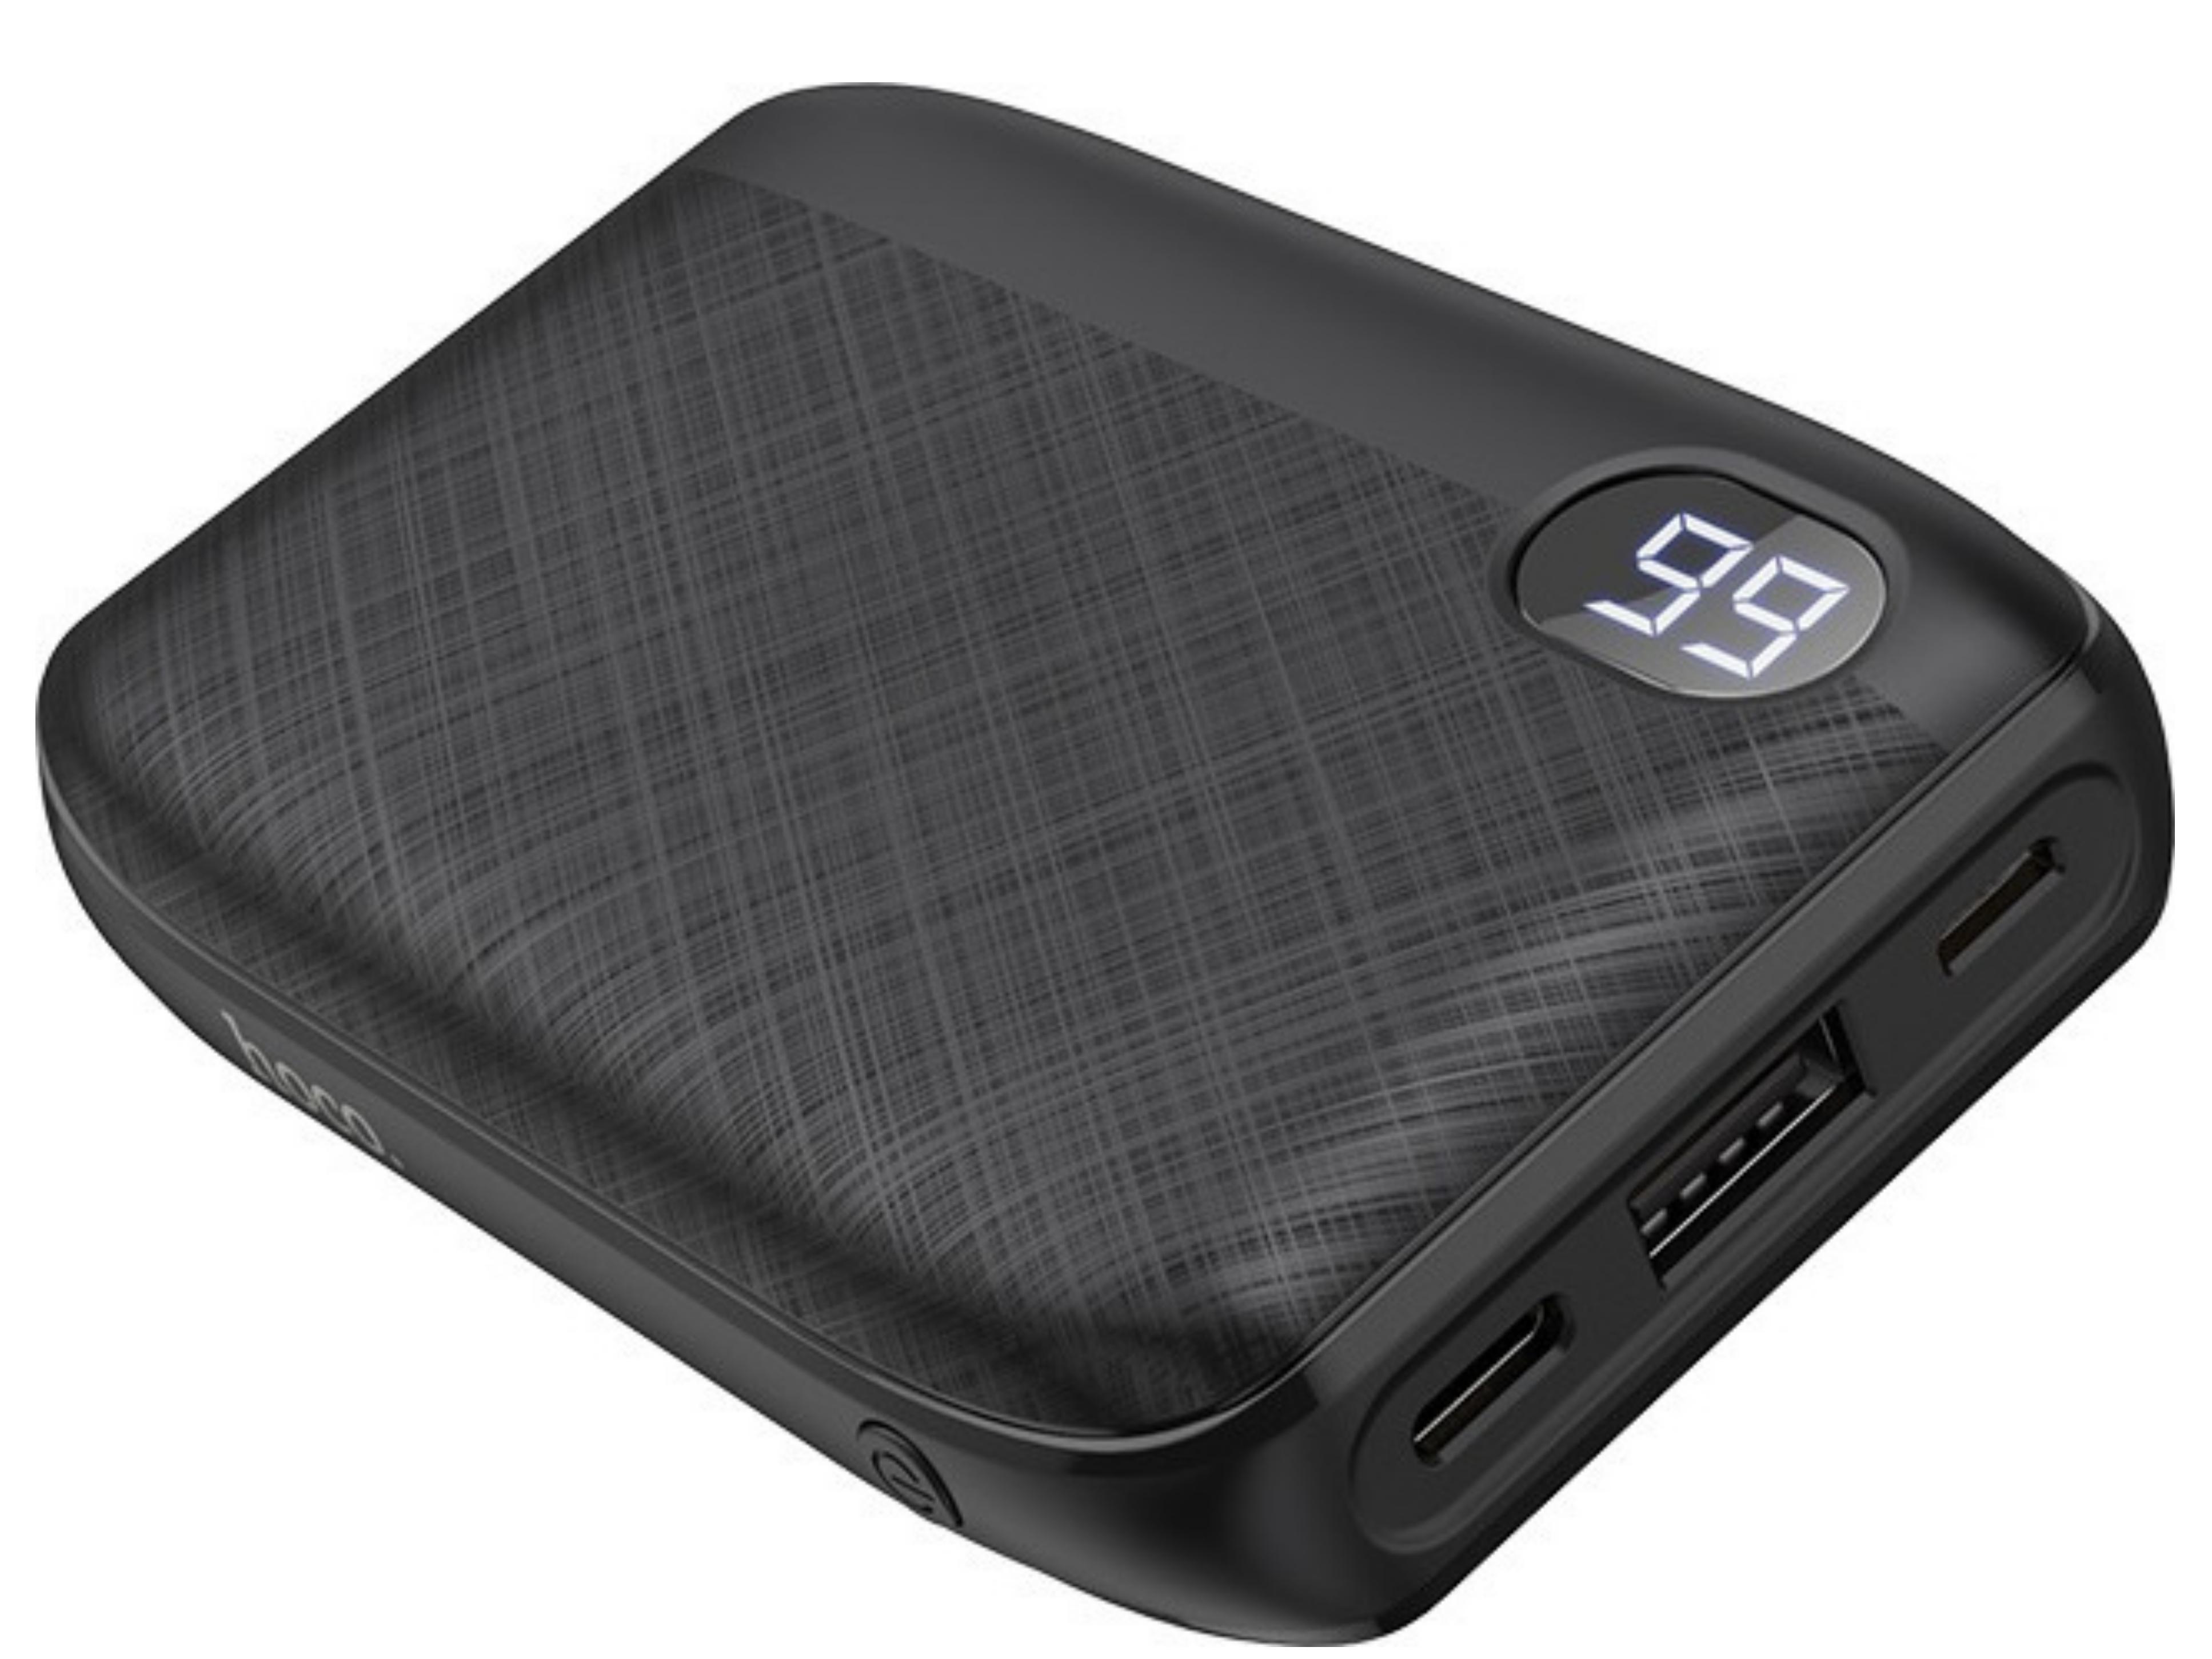 Power Bank Hoco J53 Exceptional 10000mAh USB 2A και LED Ψηφιακή Ένδειξη Μπαταρίας